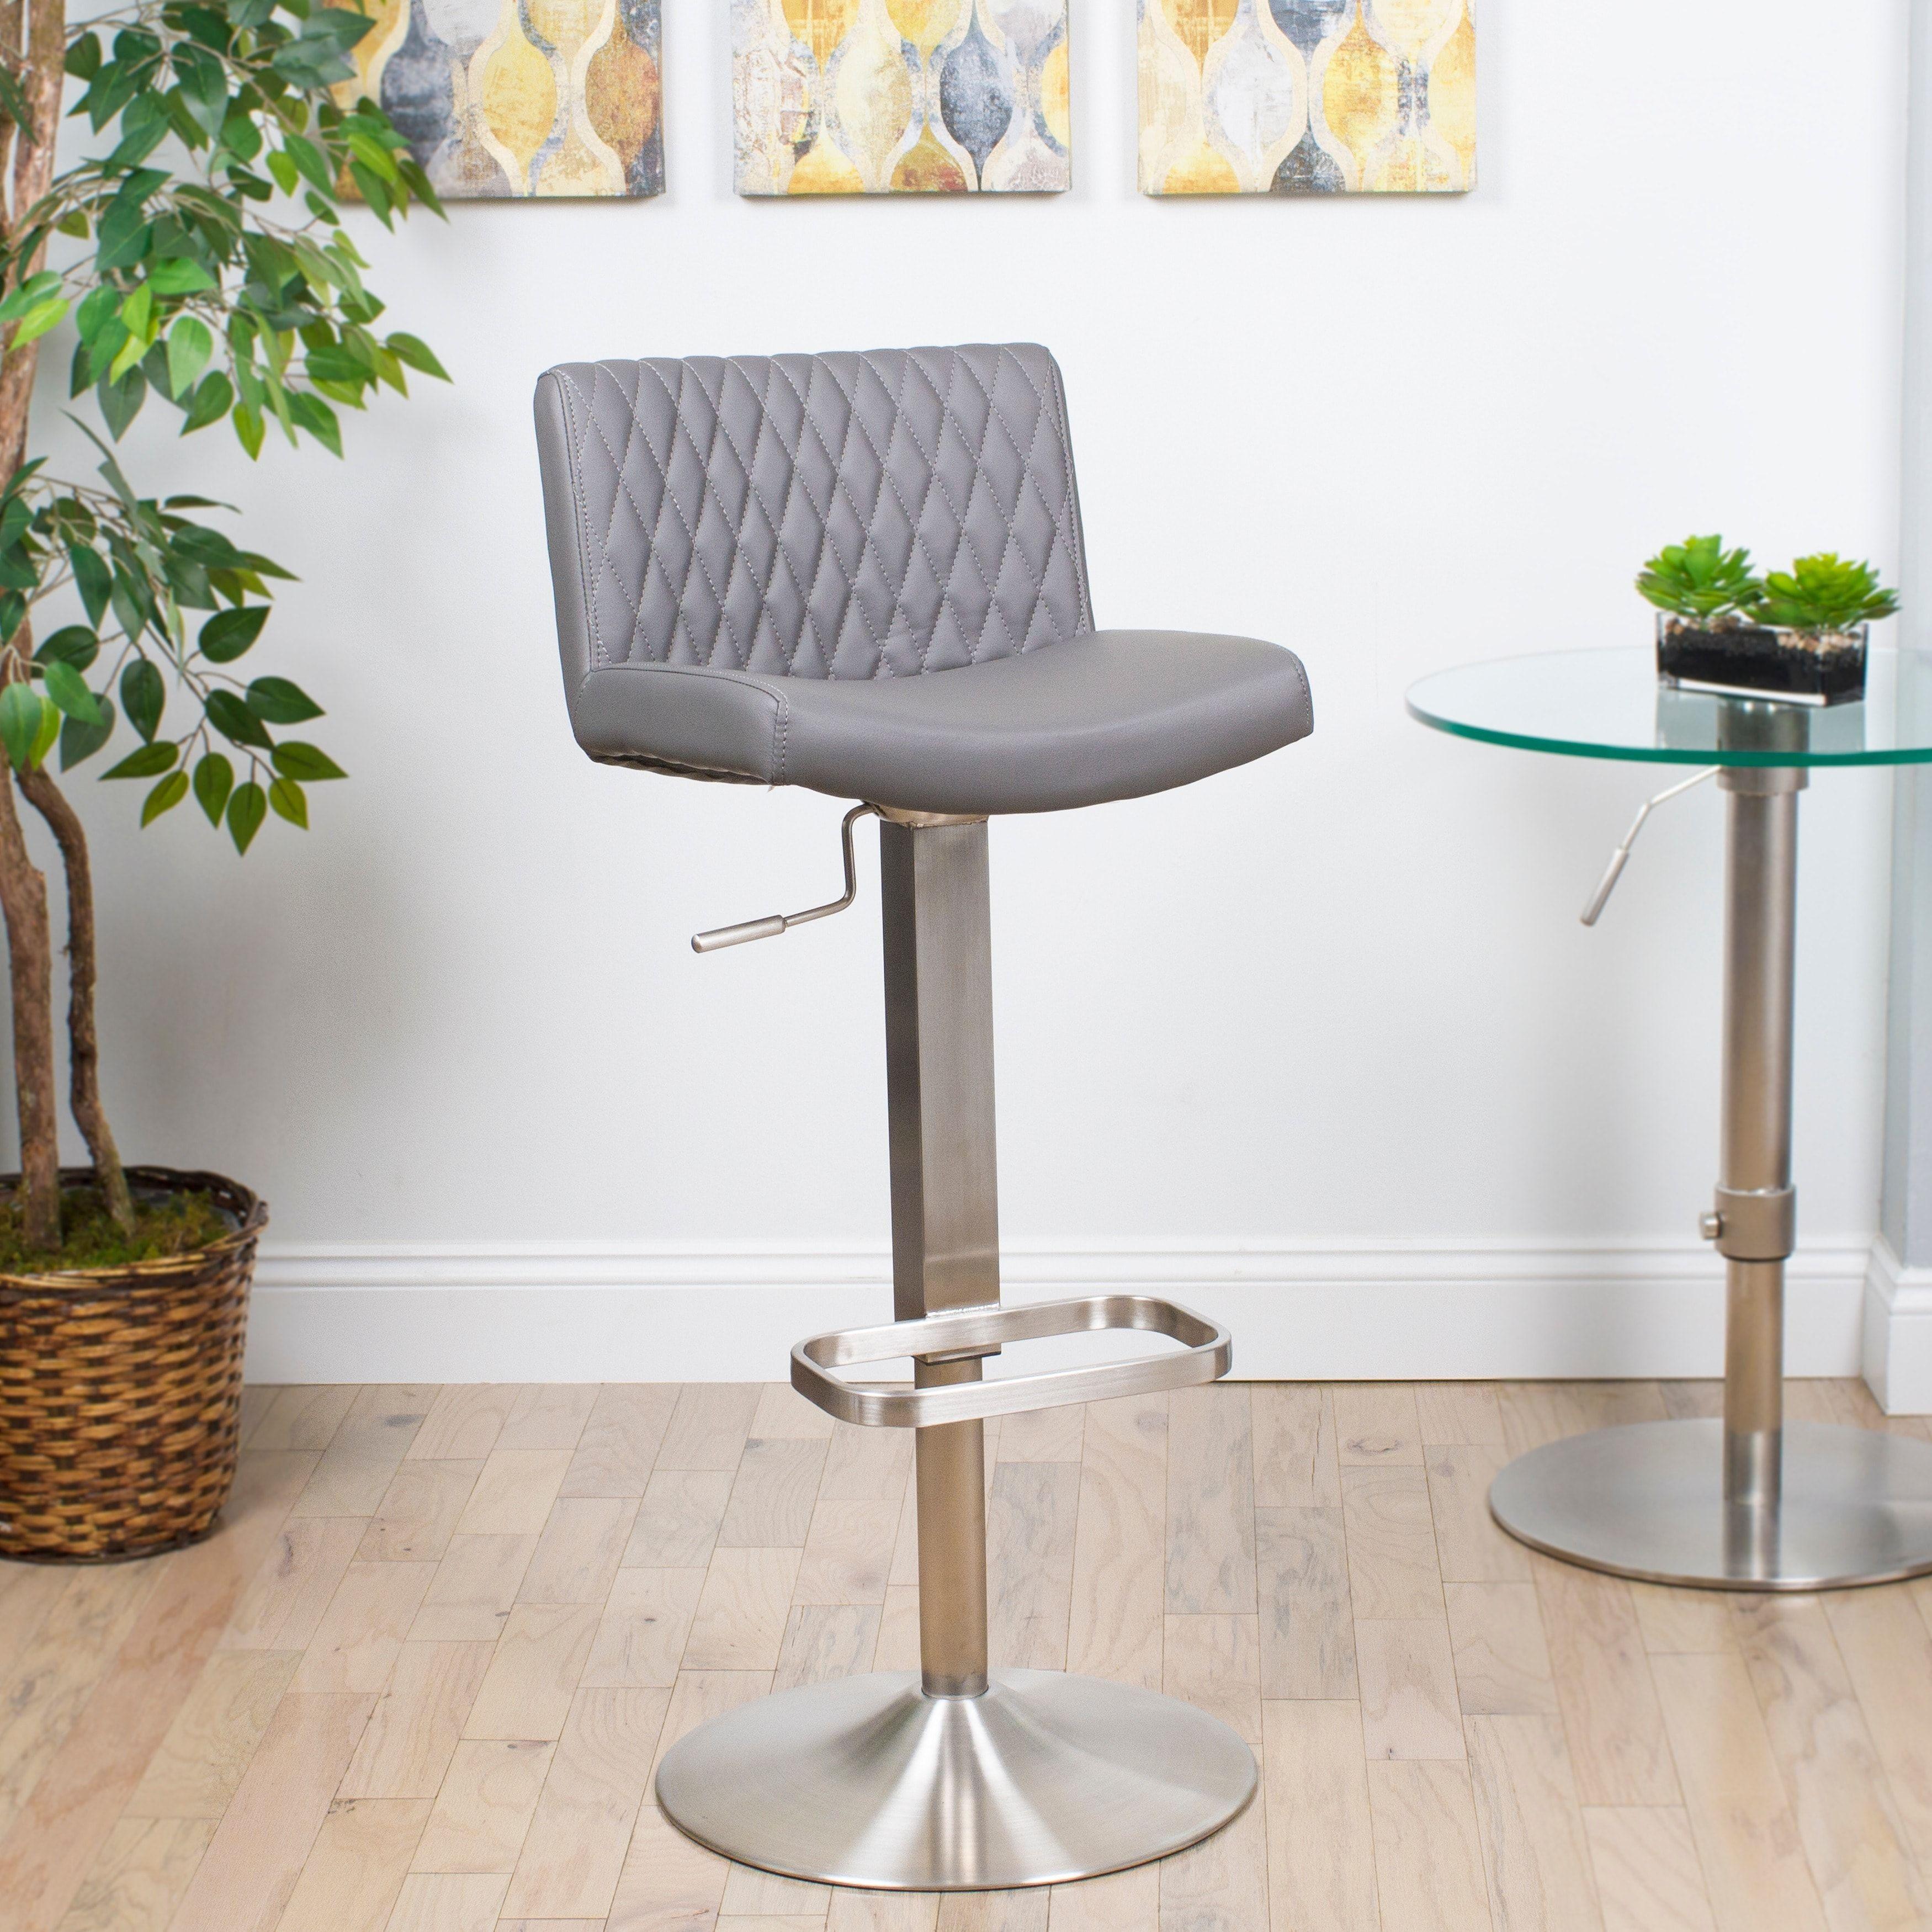 Fabulous Matrix Diamond Patterned Back Brushed Stainless Steel Ibusinesslaw Wood Chair Design Ideas Ibusinesslaworg